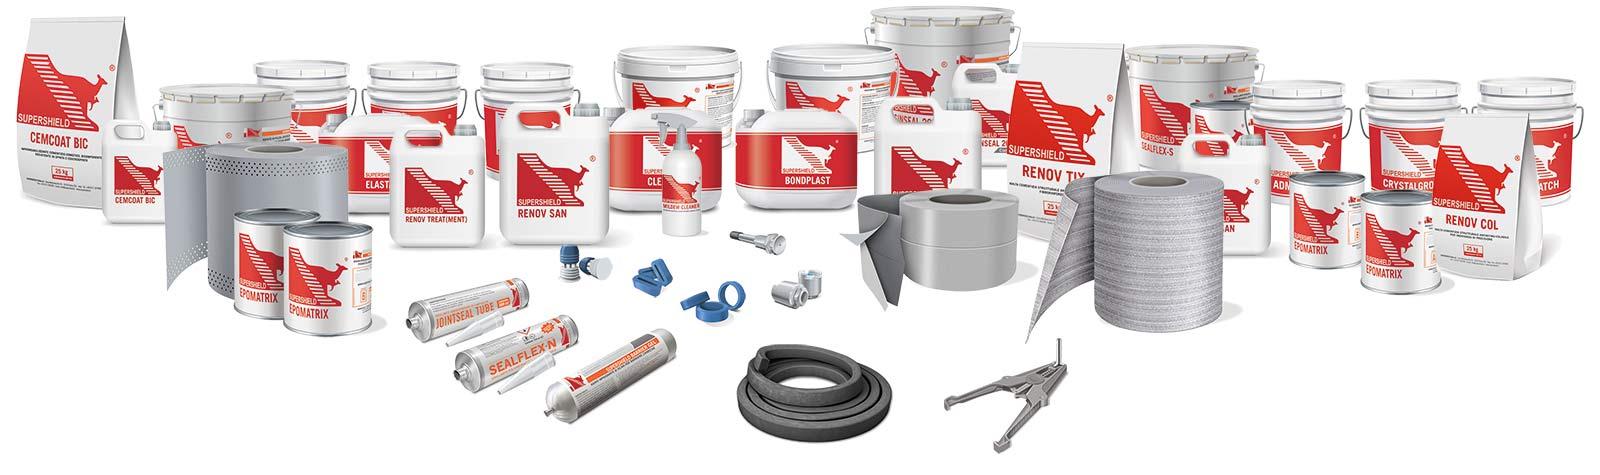 supershield range products